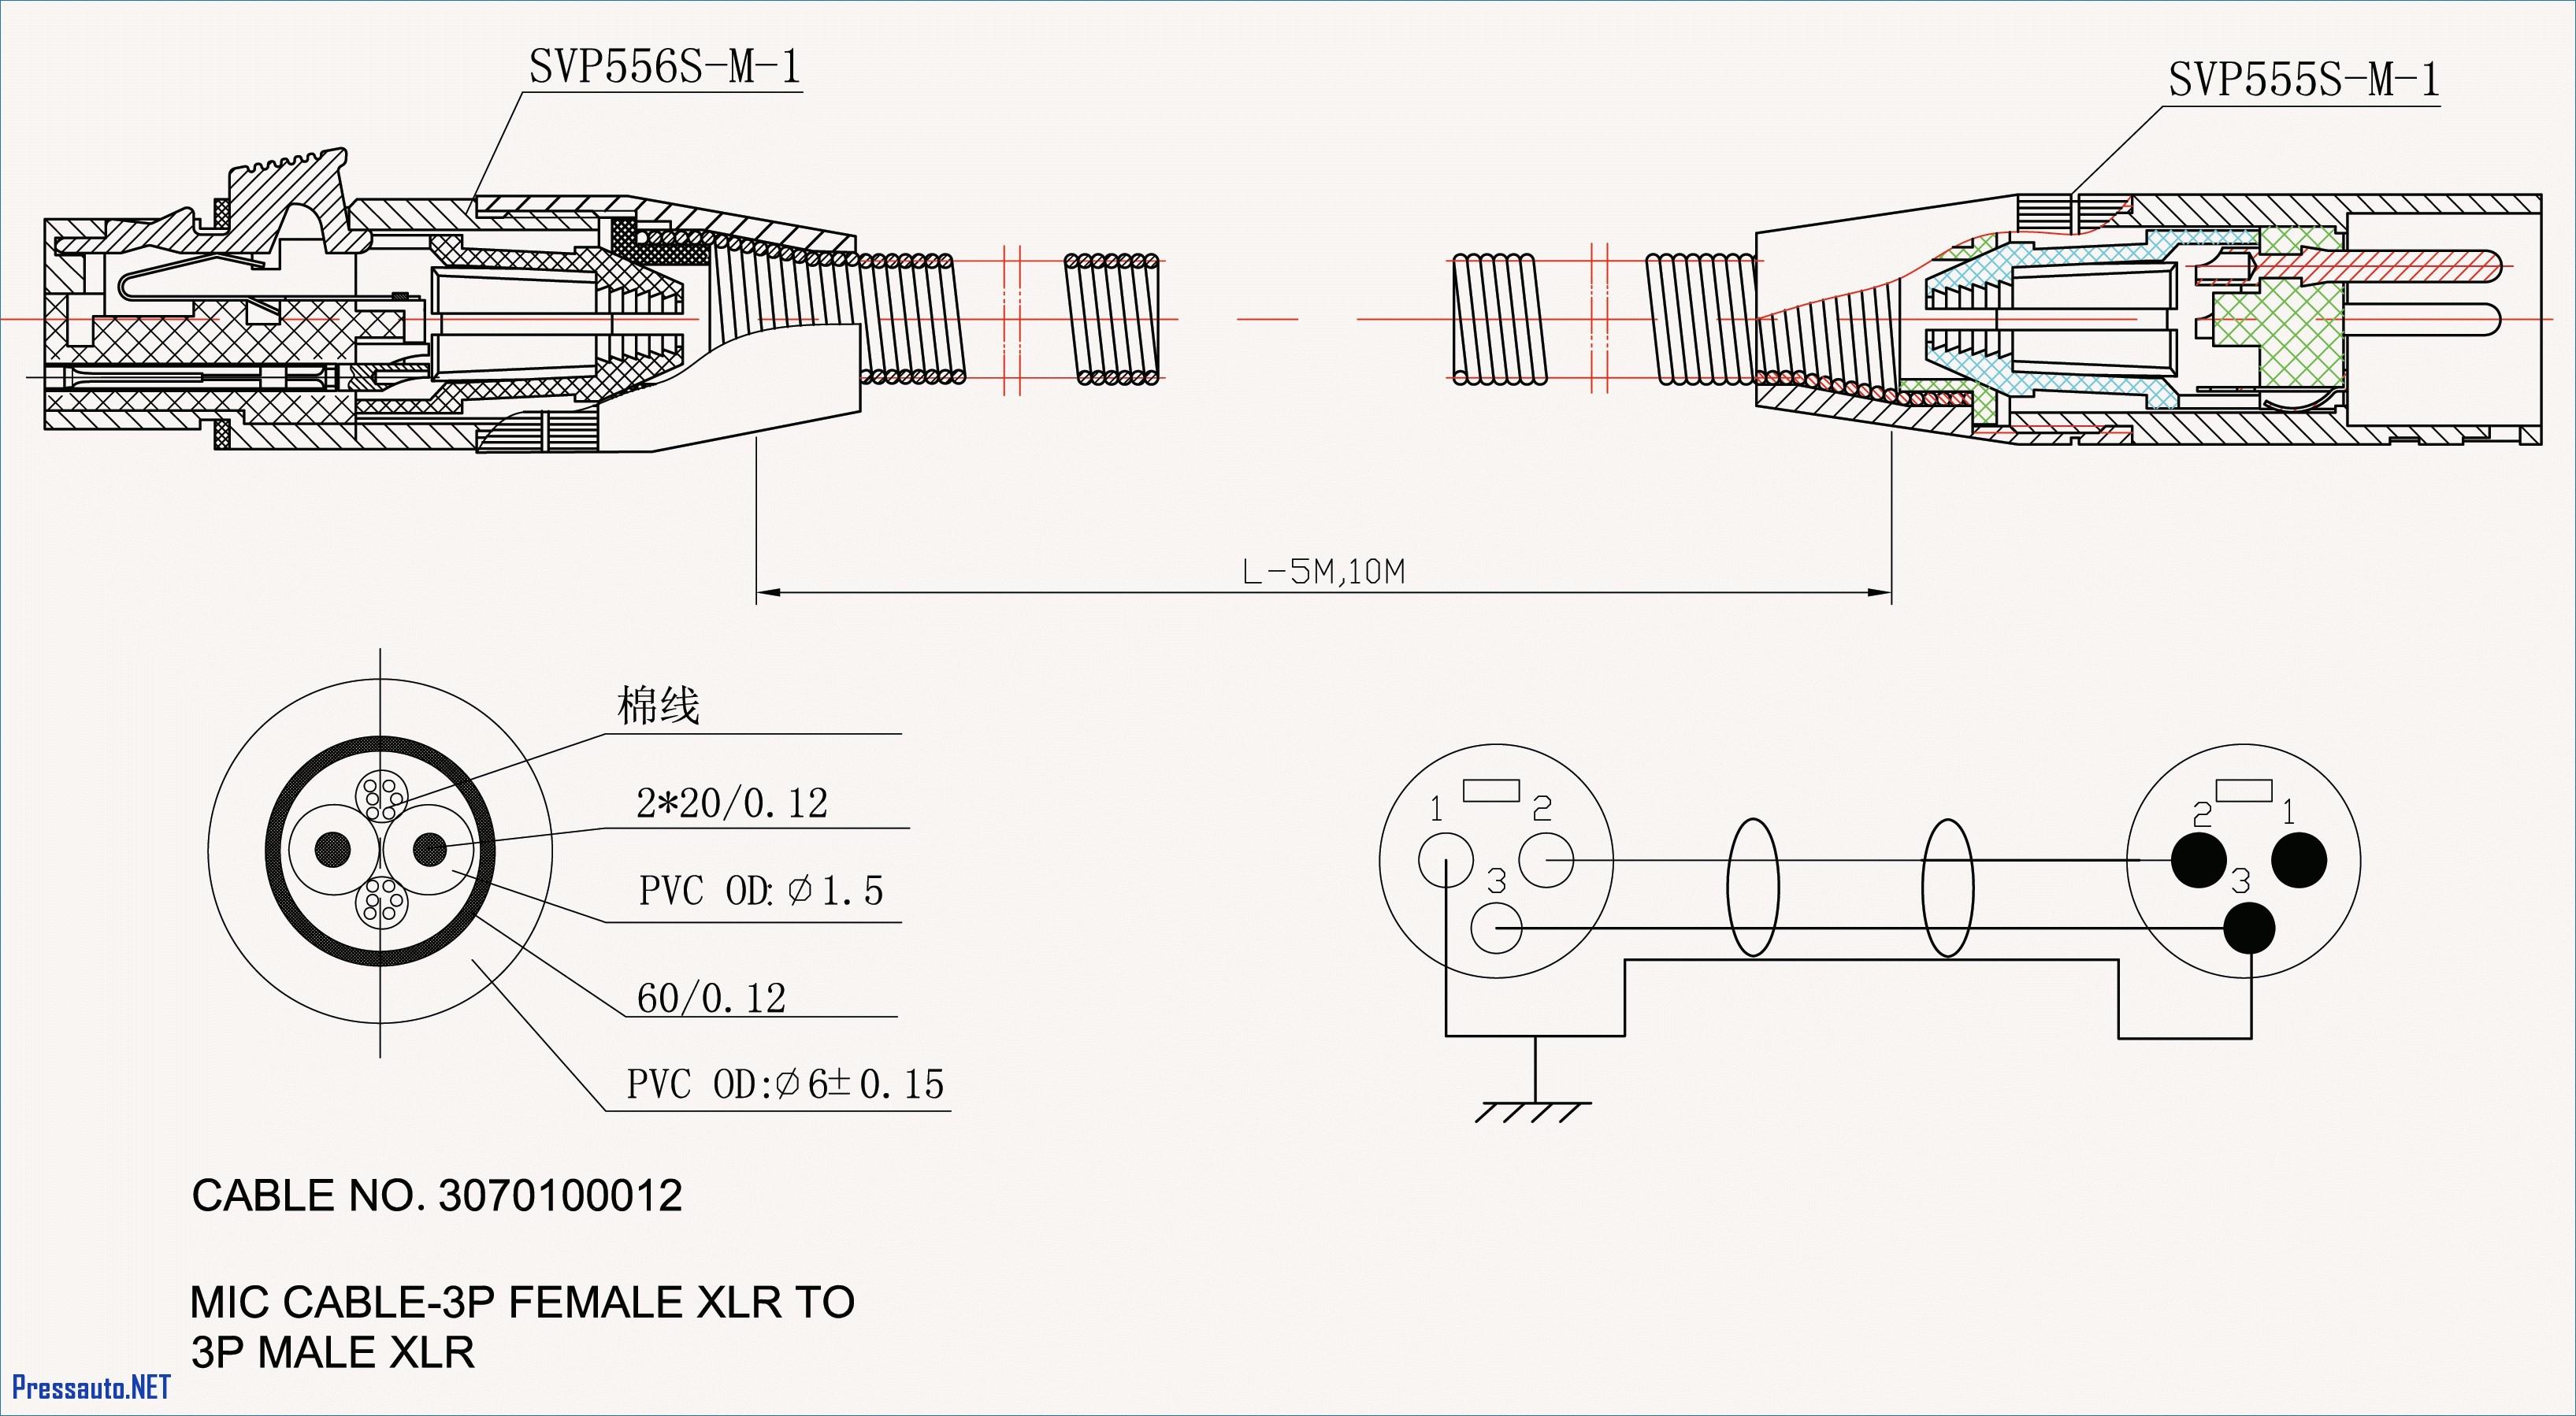 Us Motors Wiring Diagram Detailed Schematics Electrical Schematic Unique Image Emerson Electric Motor